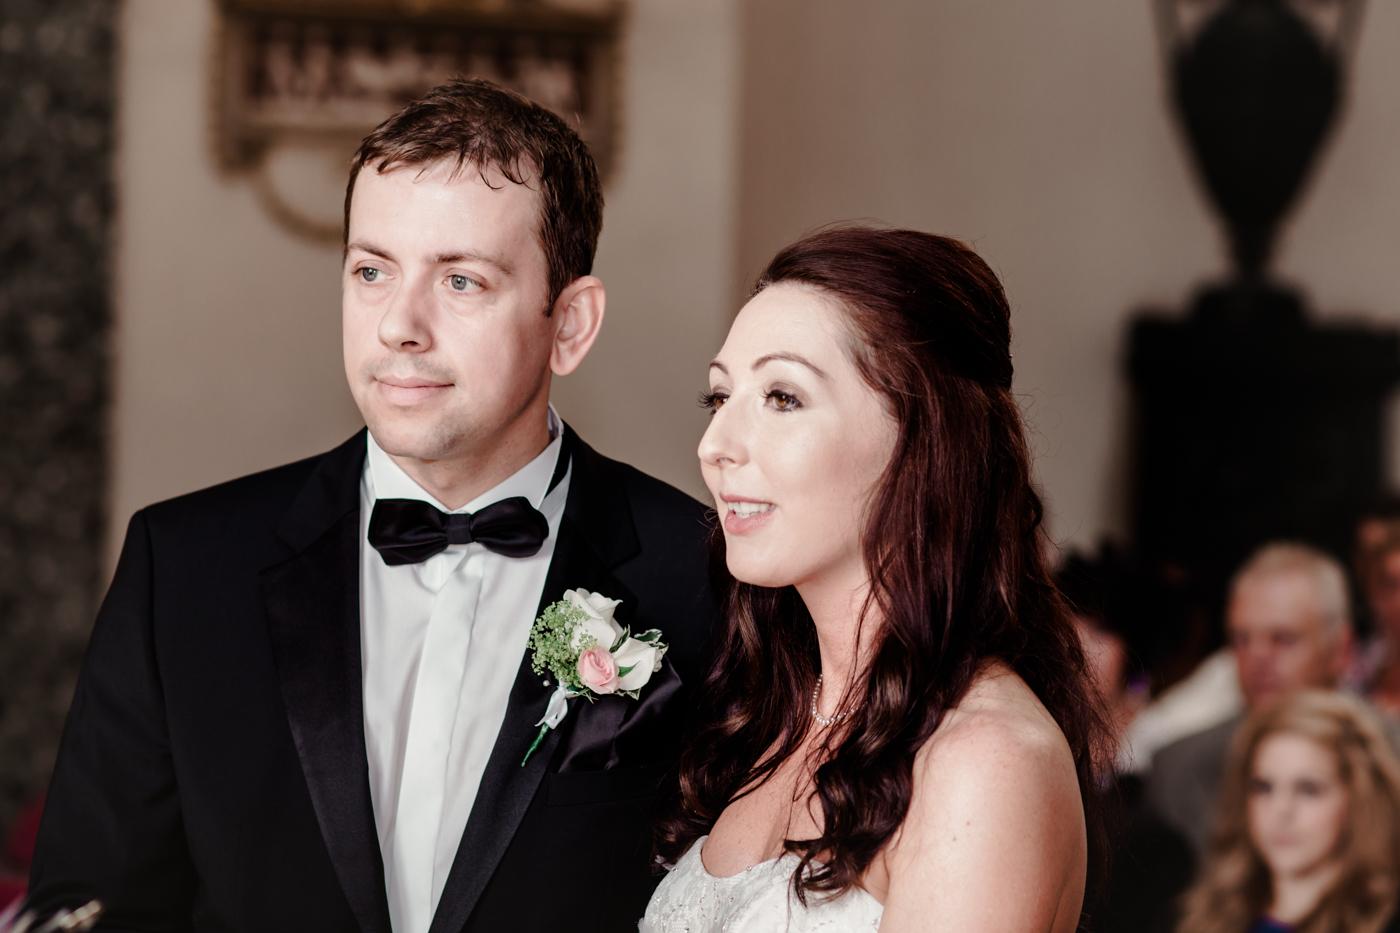 055 - Abi and Chris at Kedleston Hall - Wedding Photography by Mark Pugh www.markpugh.com - 0144.JPG